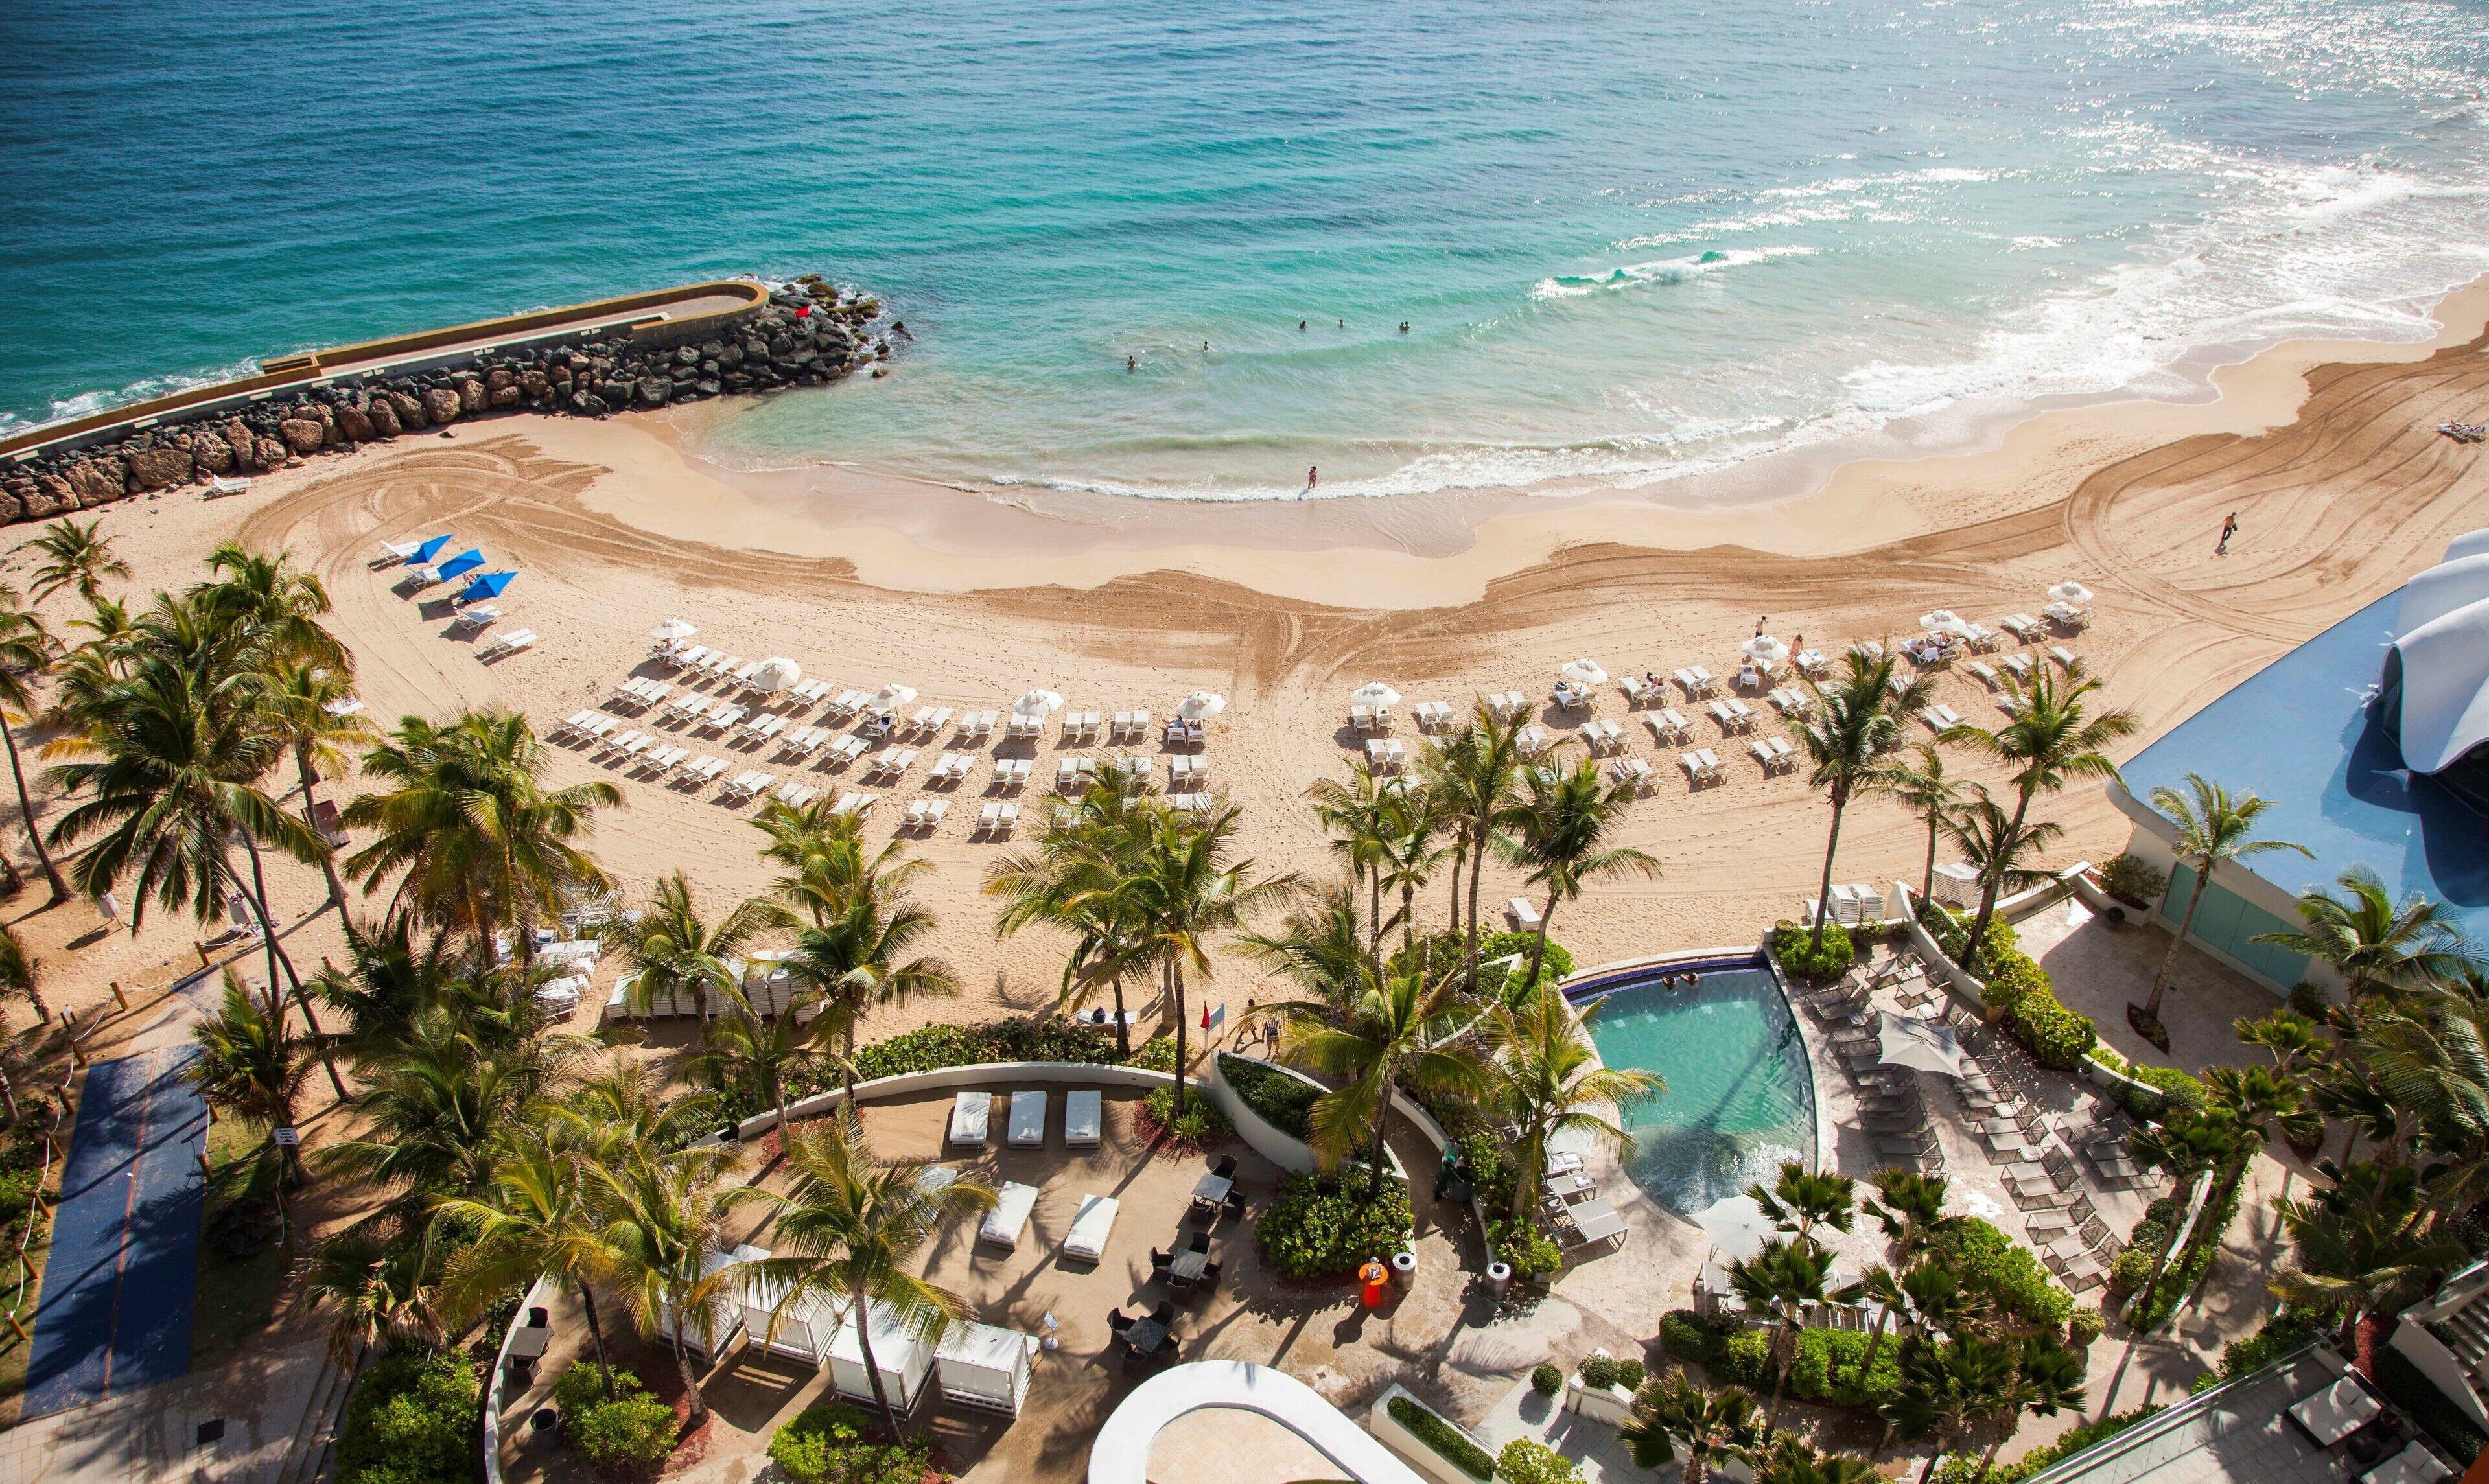 La Concha Renaissance Resort is one of the best hotels in San Juan, Puerto Rico